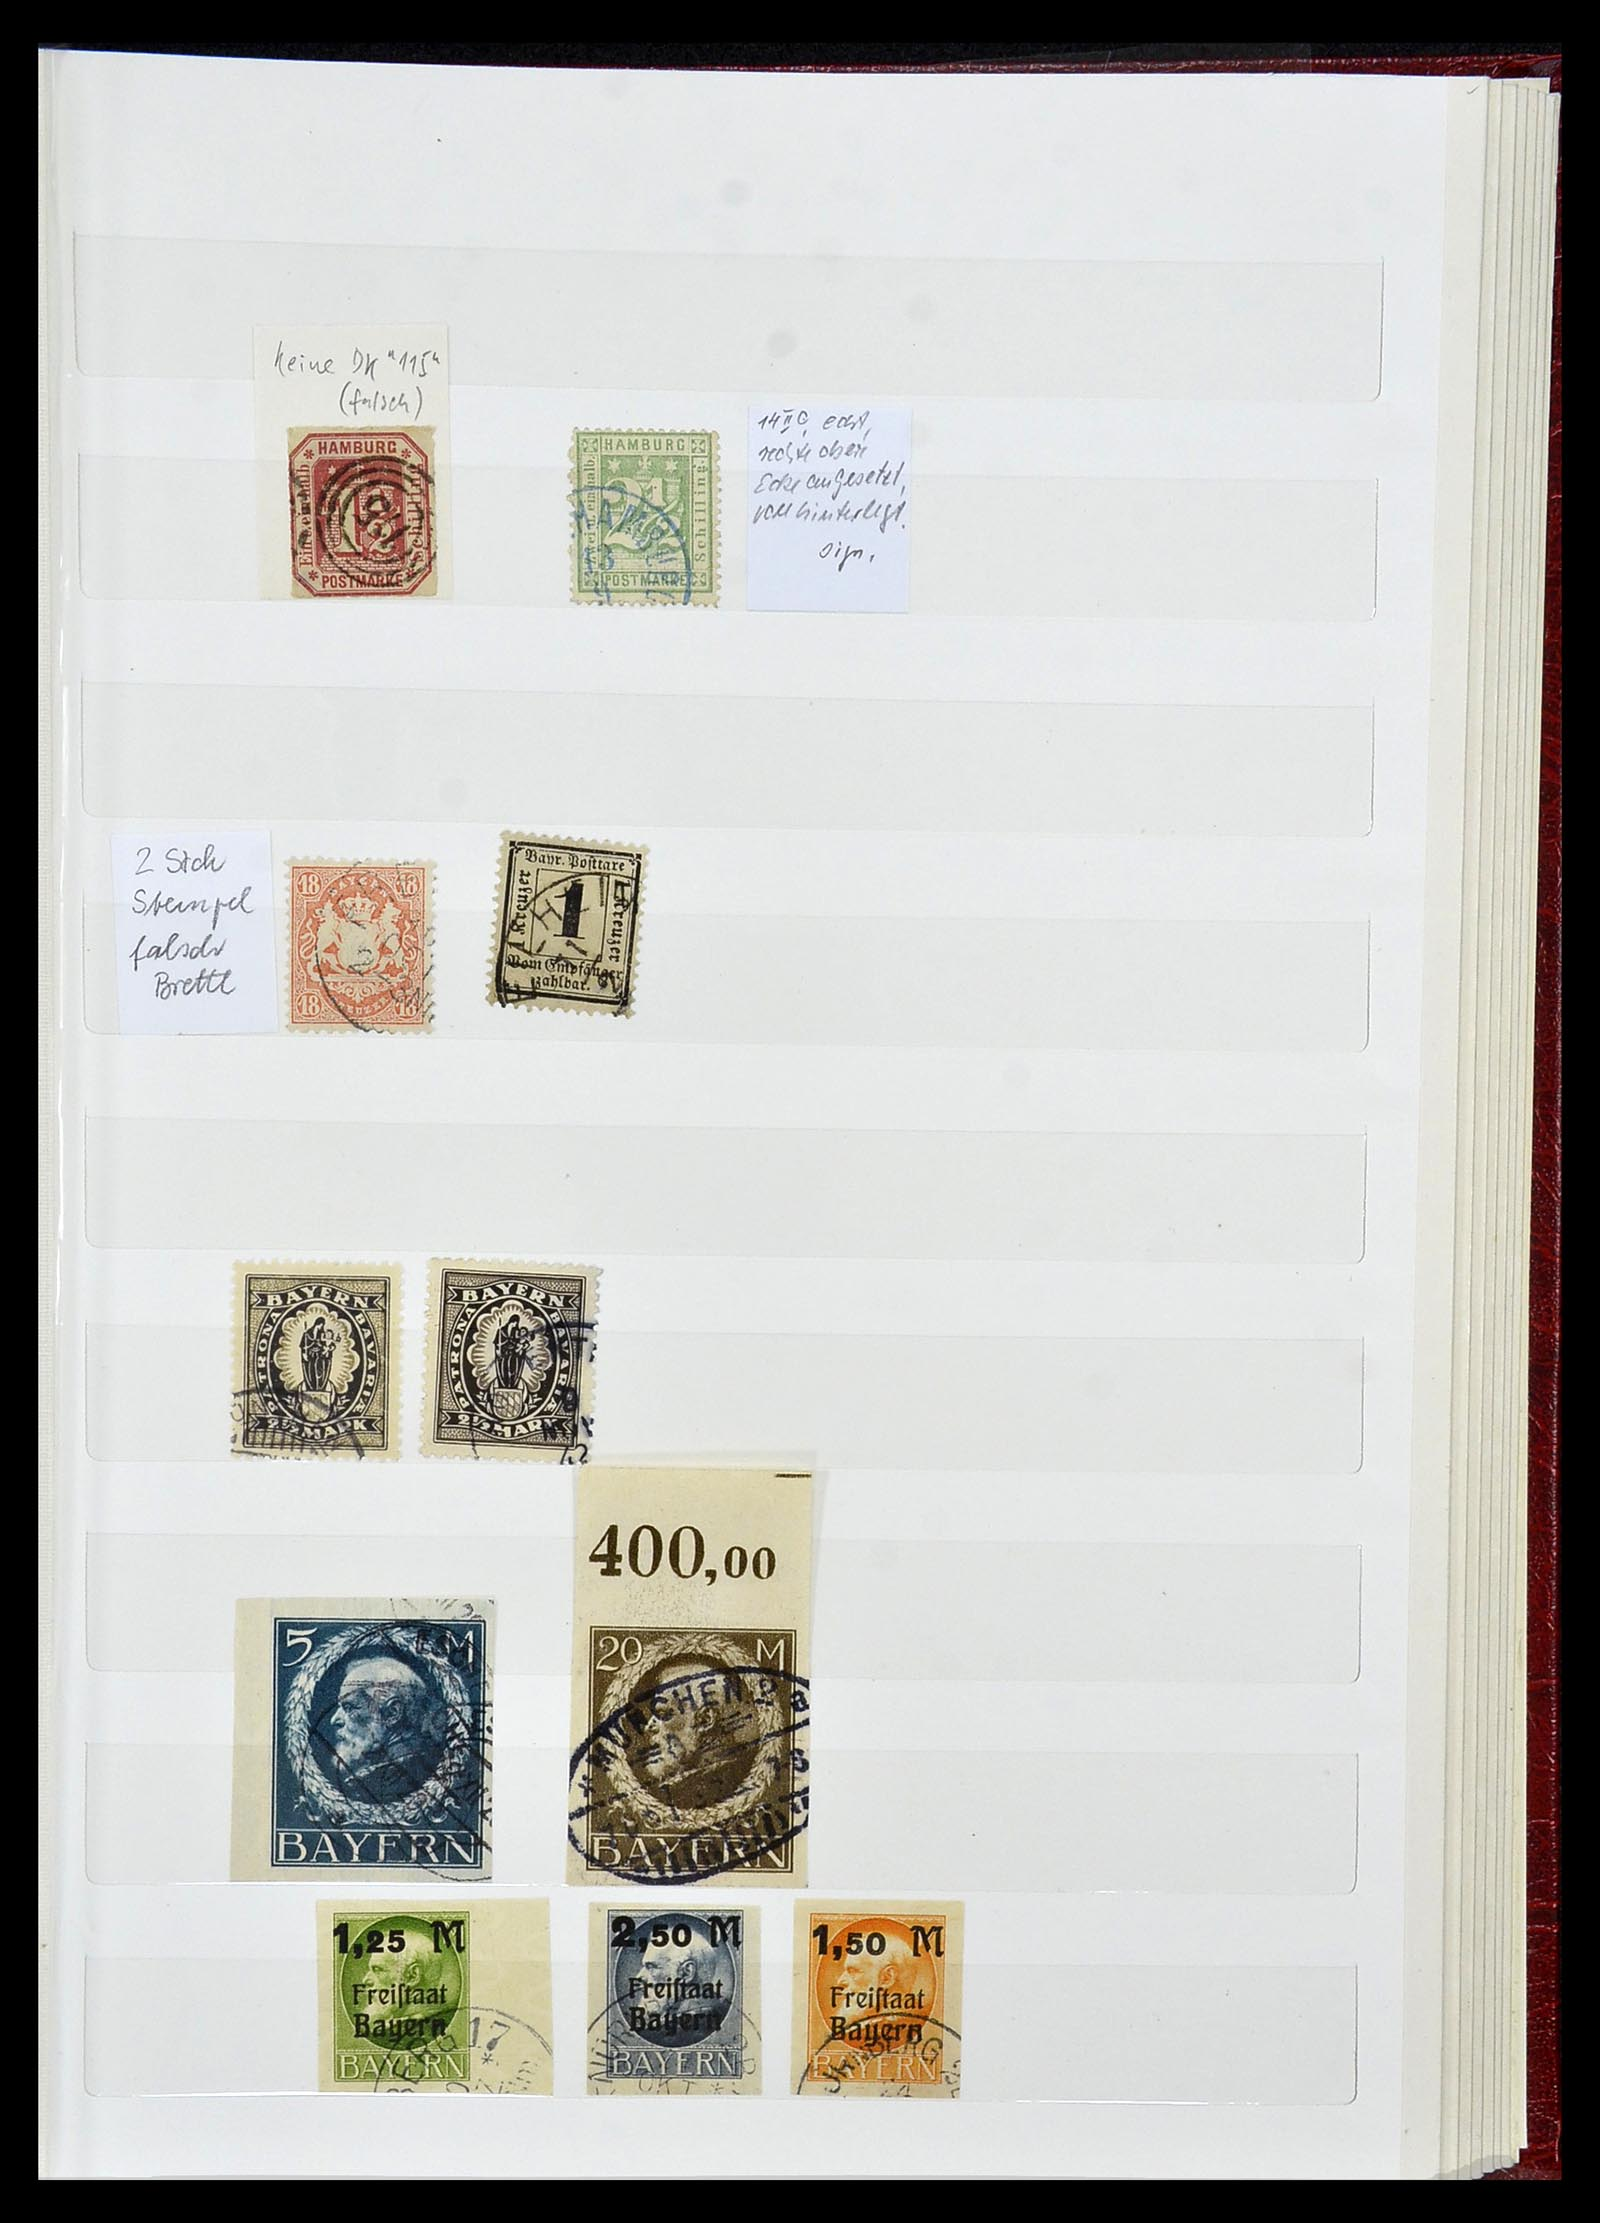 34069 018 - Postzegelverzameling 34069 Duitsland 1855-1952.